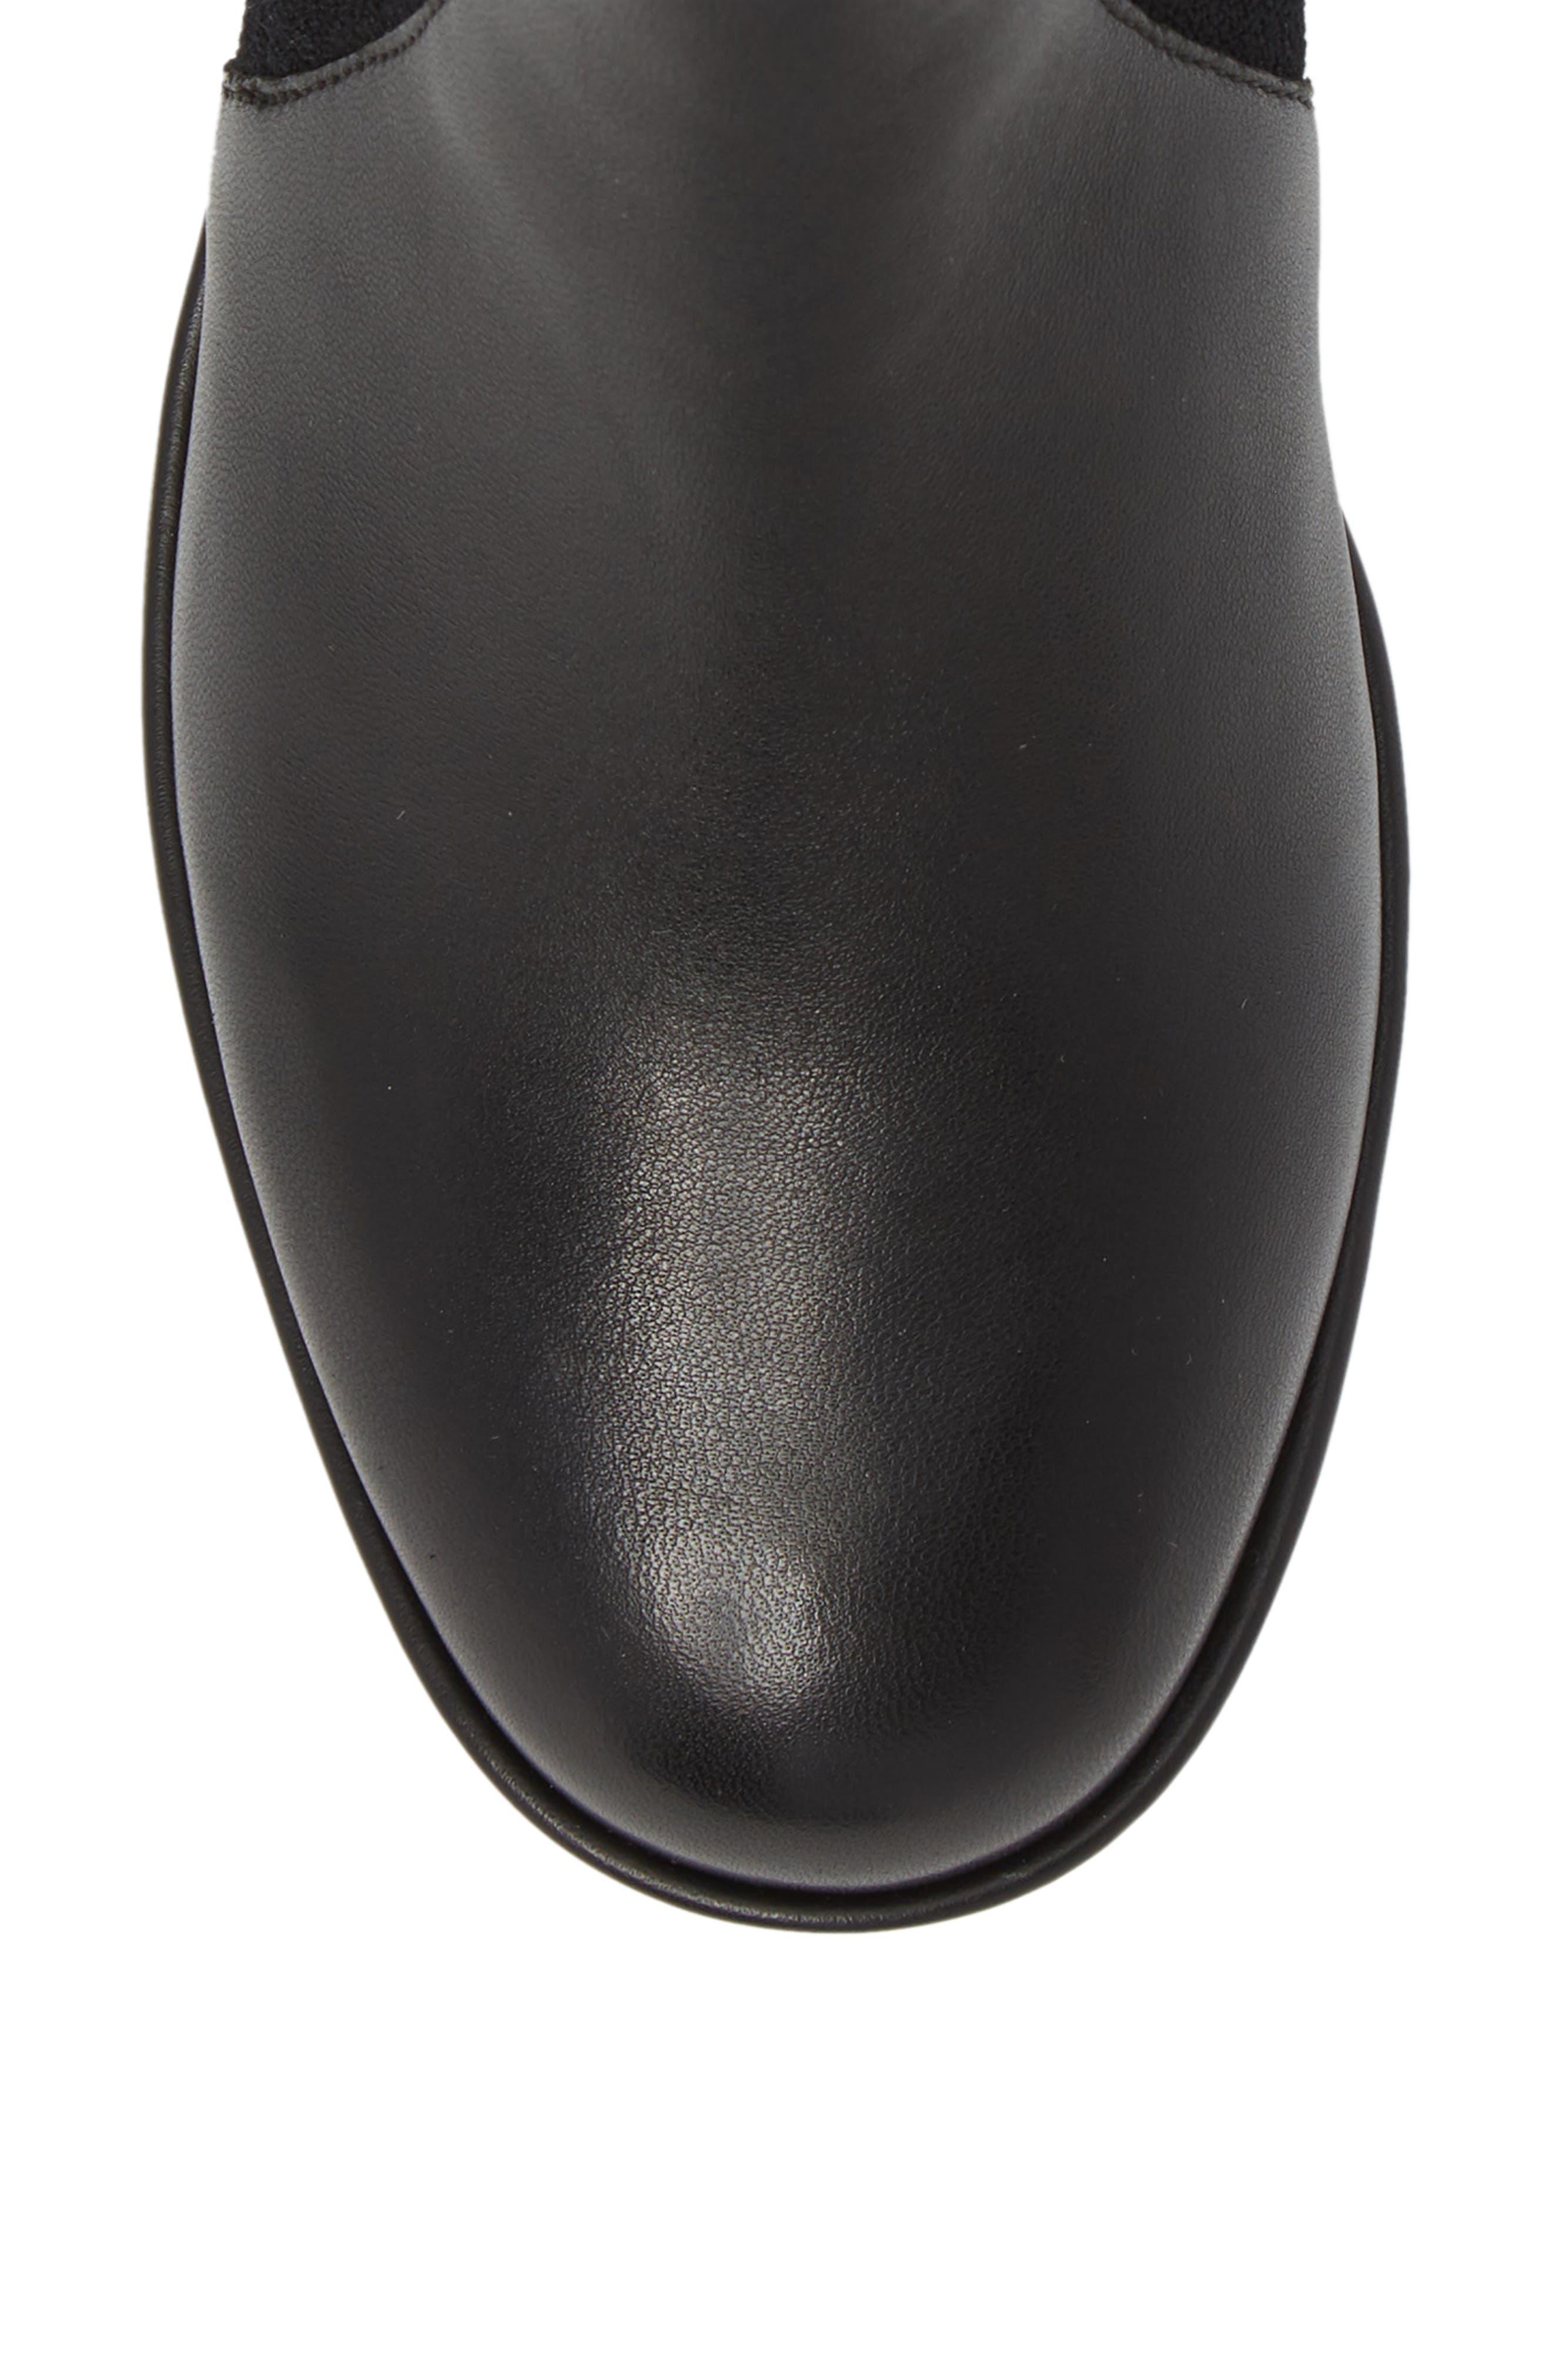 Sisea Platform Wedge Stretch Bootie,                             Alternate thumbnail 5, color,                             BLACK FABRIC